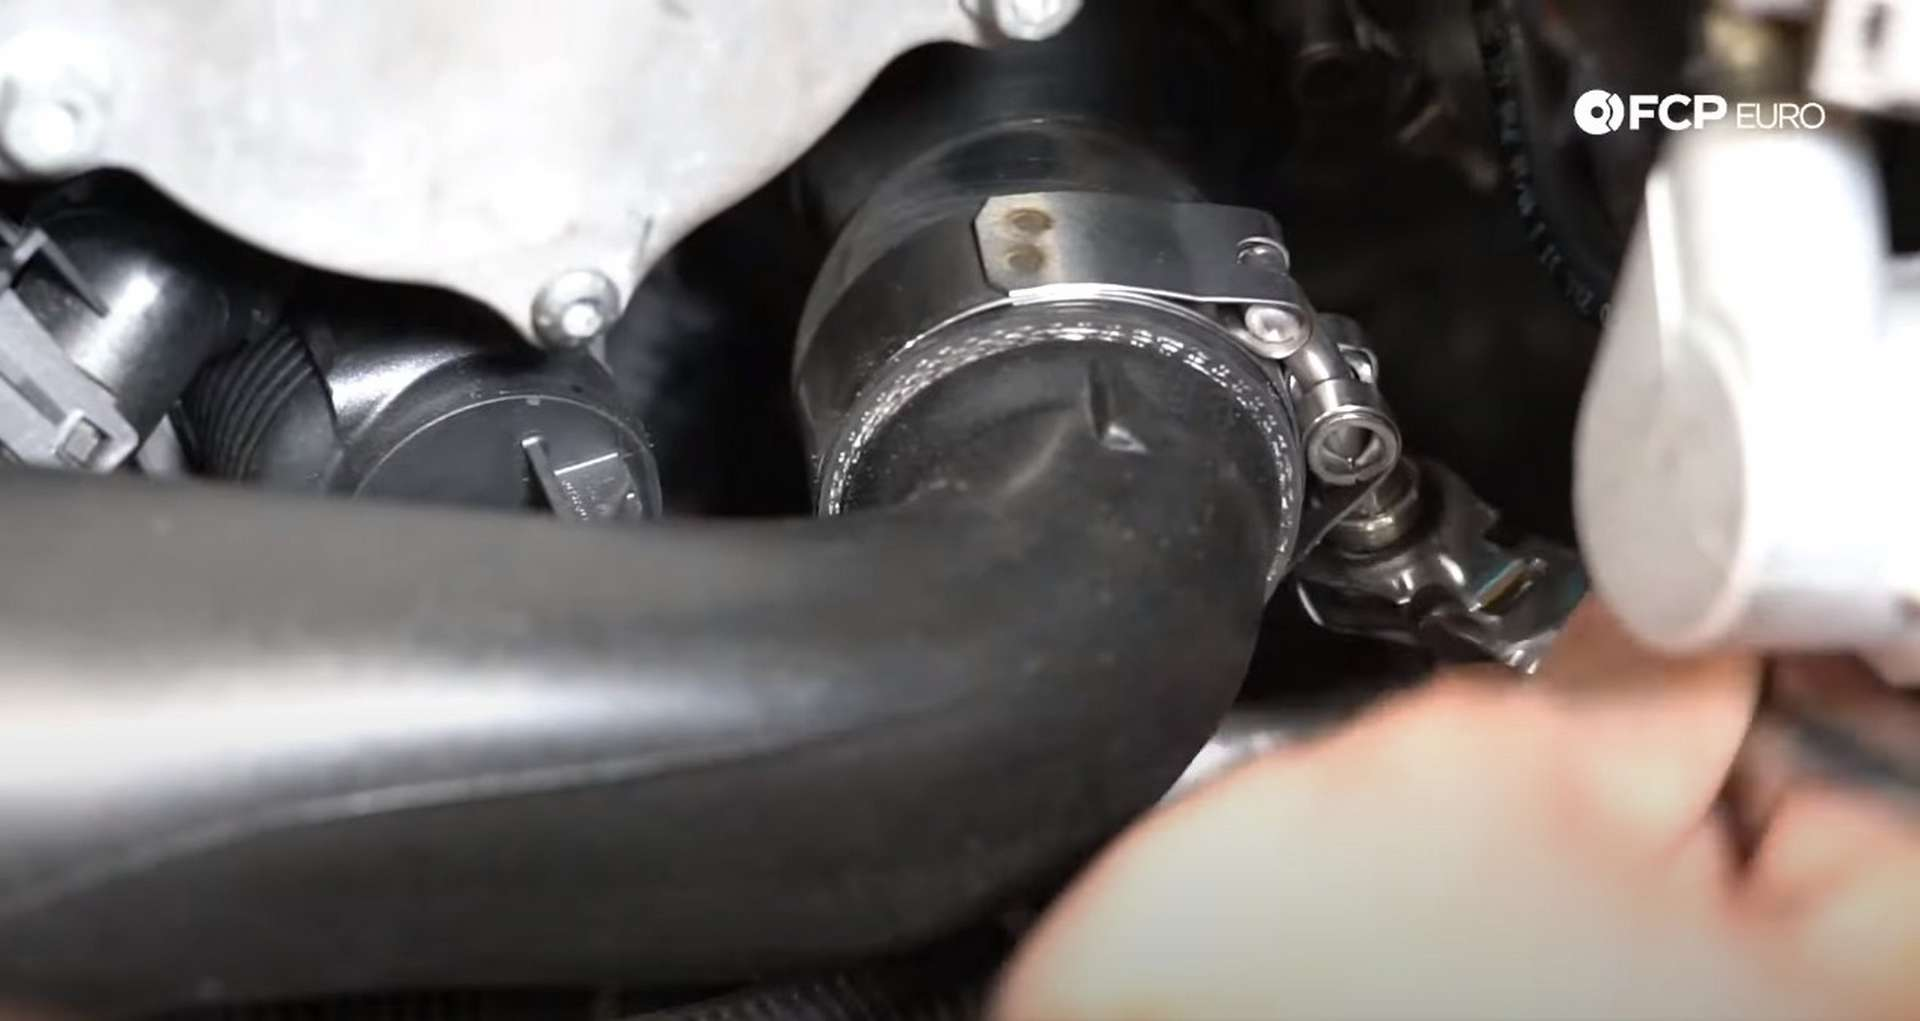 71-DIY_VW_GTI_Clutch-Job-Reinstalling-Buttoning-Engine-Bay